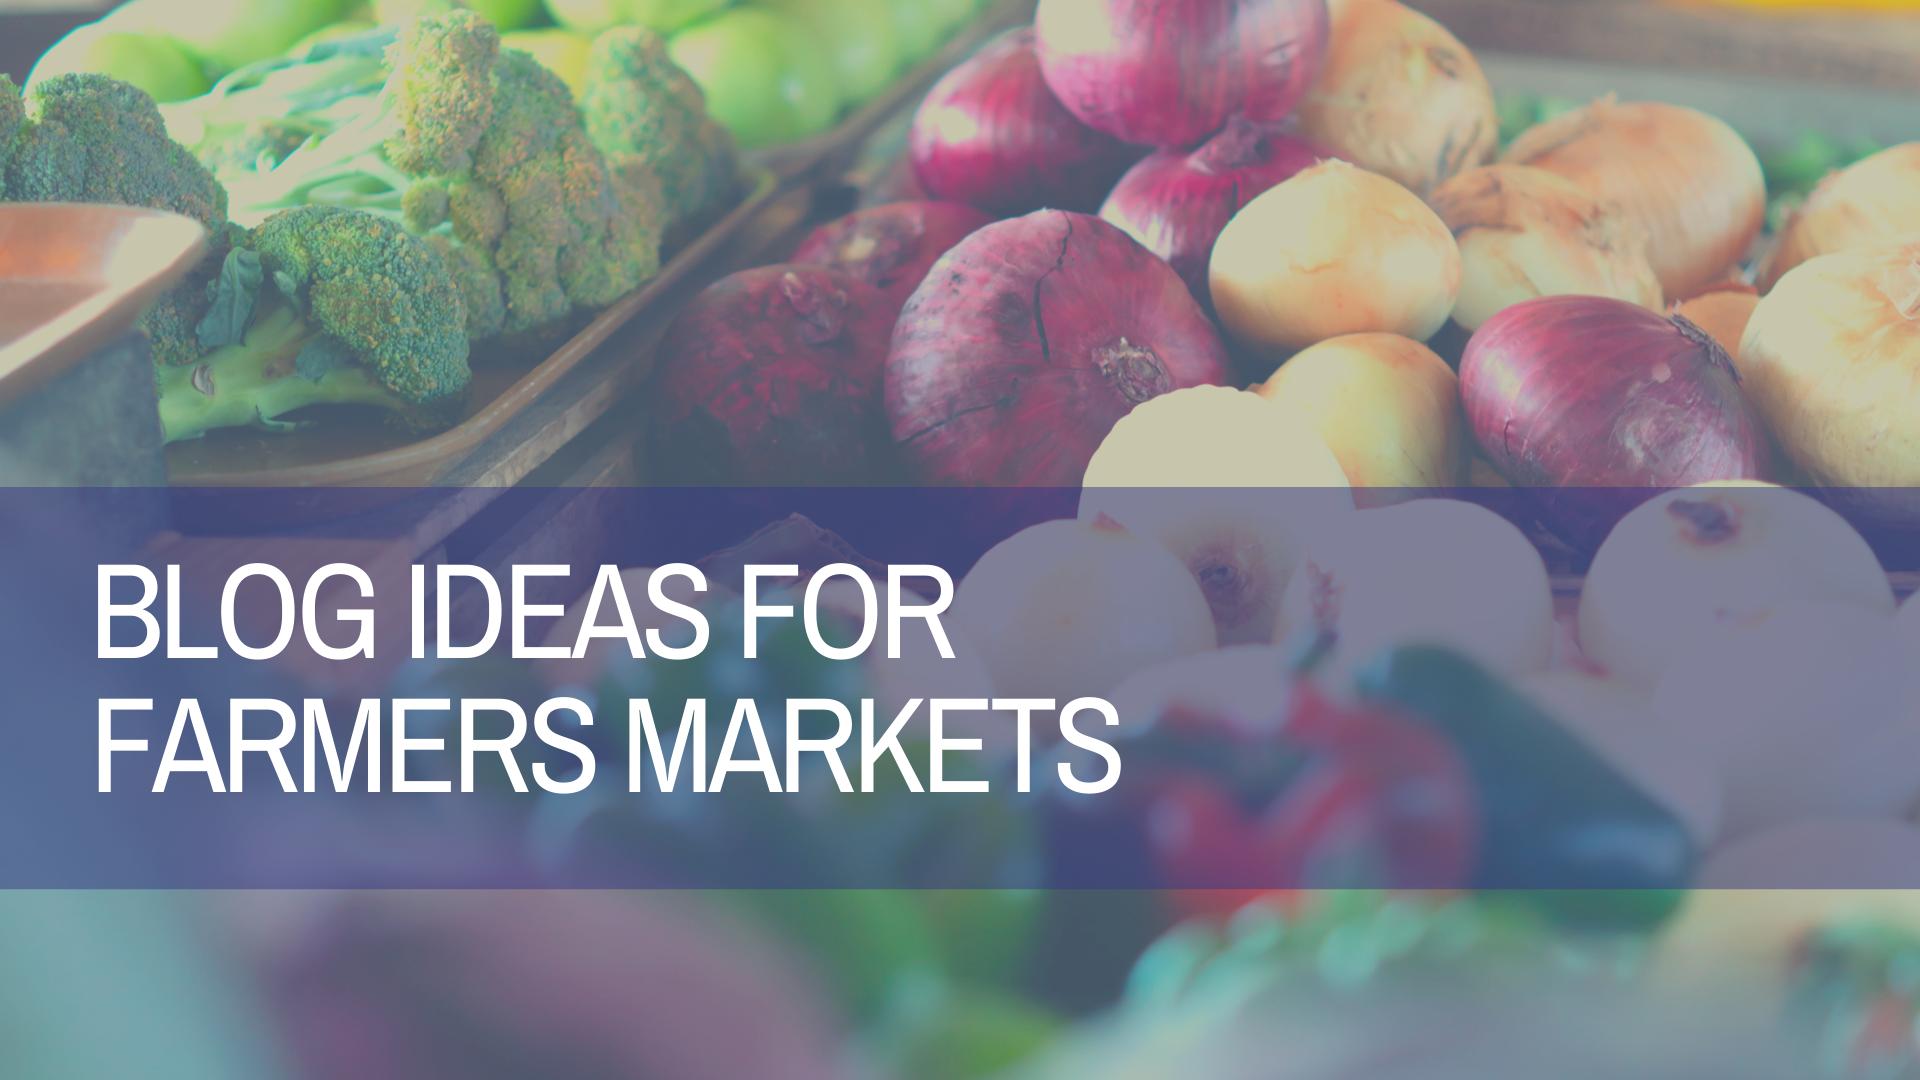 Blog Ideas for Farmers Markets